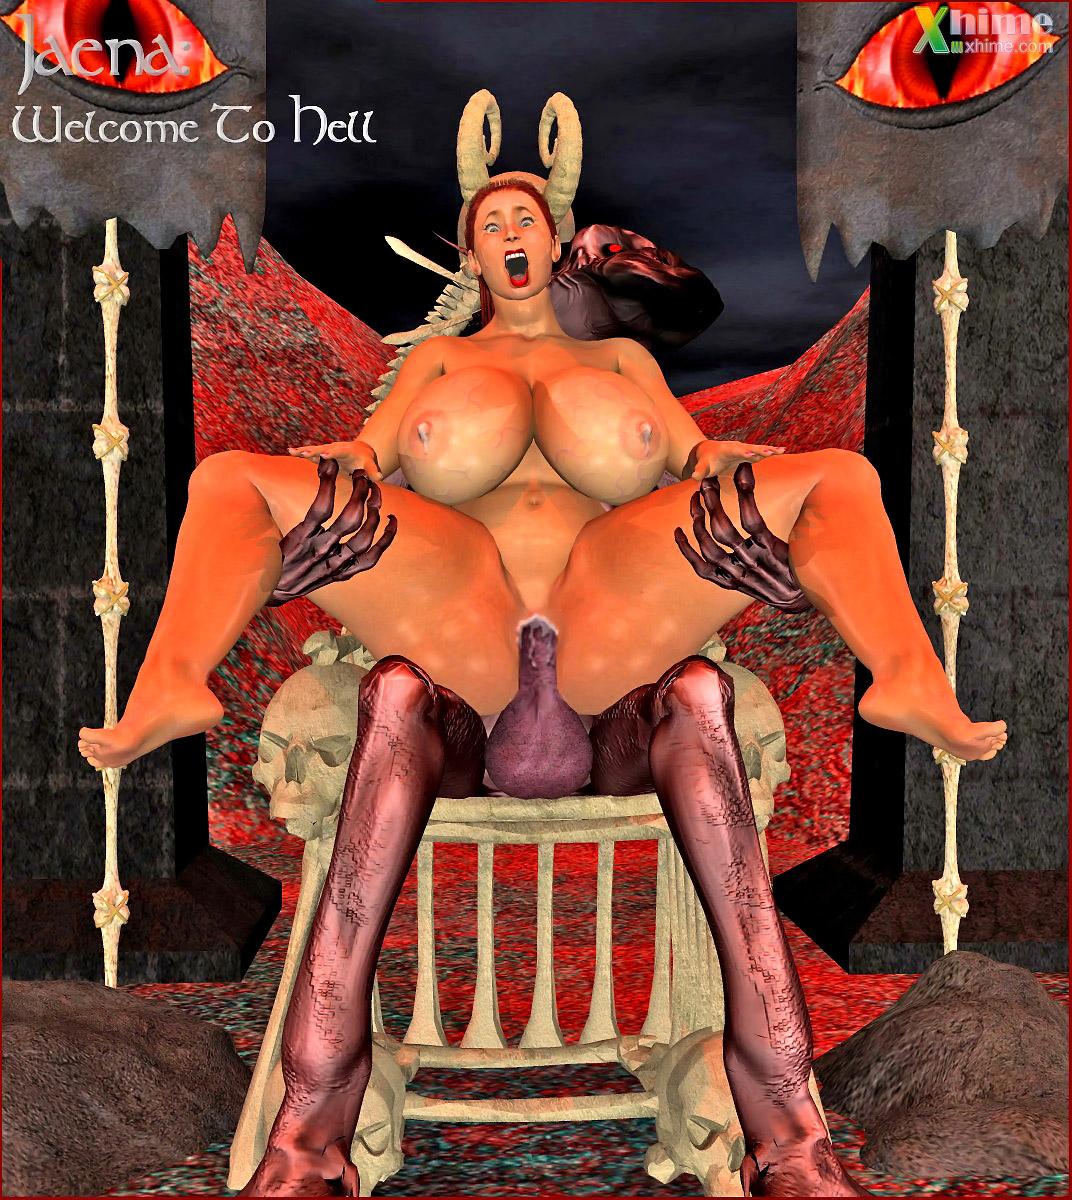 Centaur porn 3d pics hentai picture